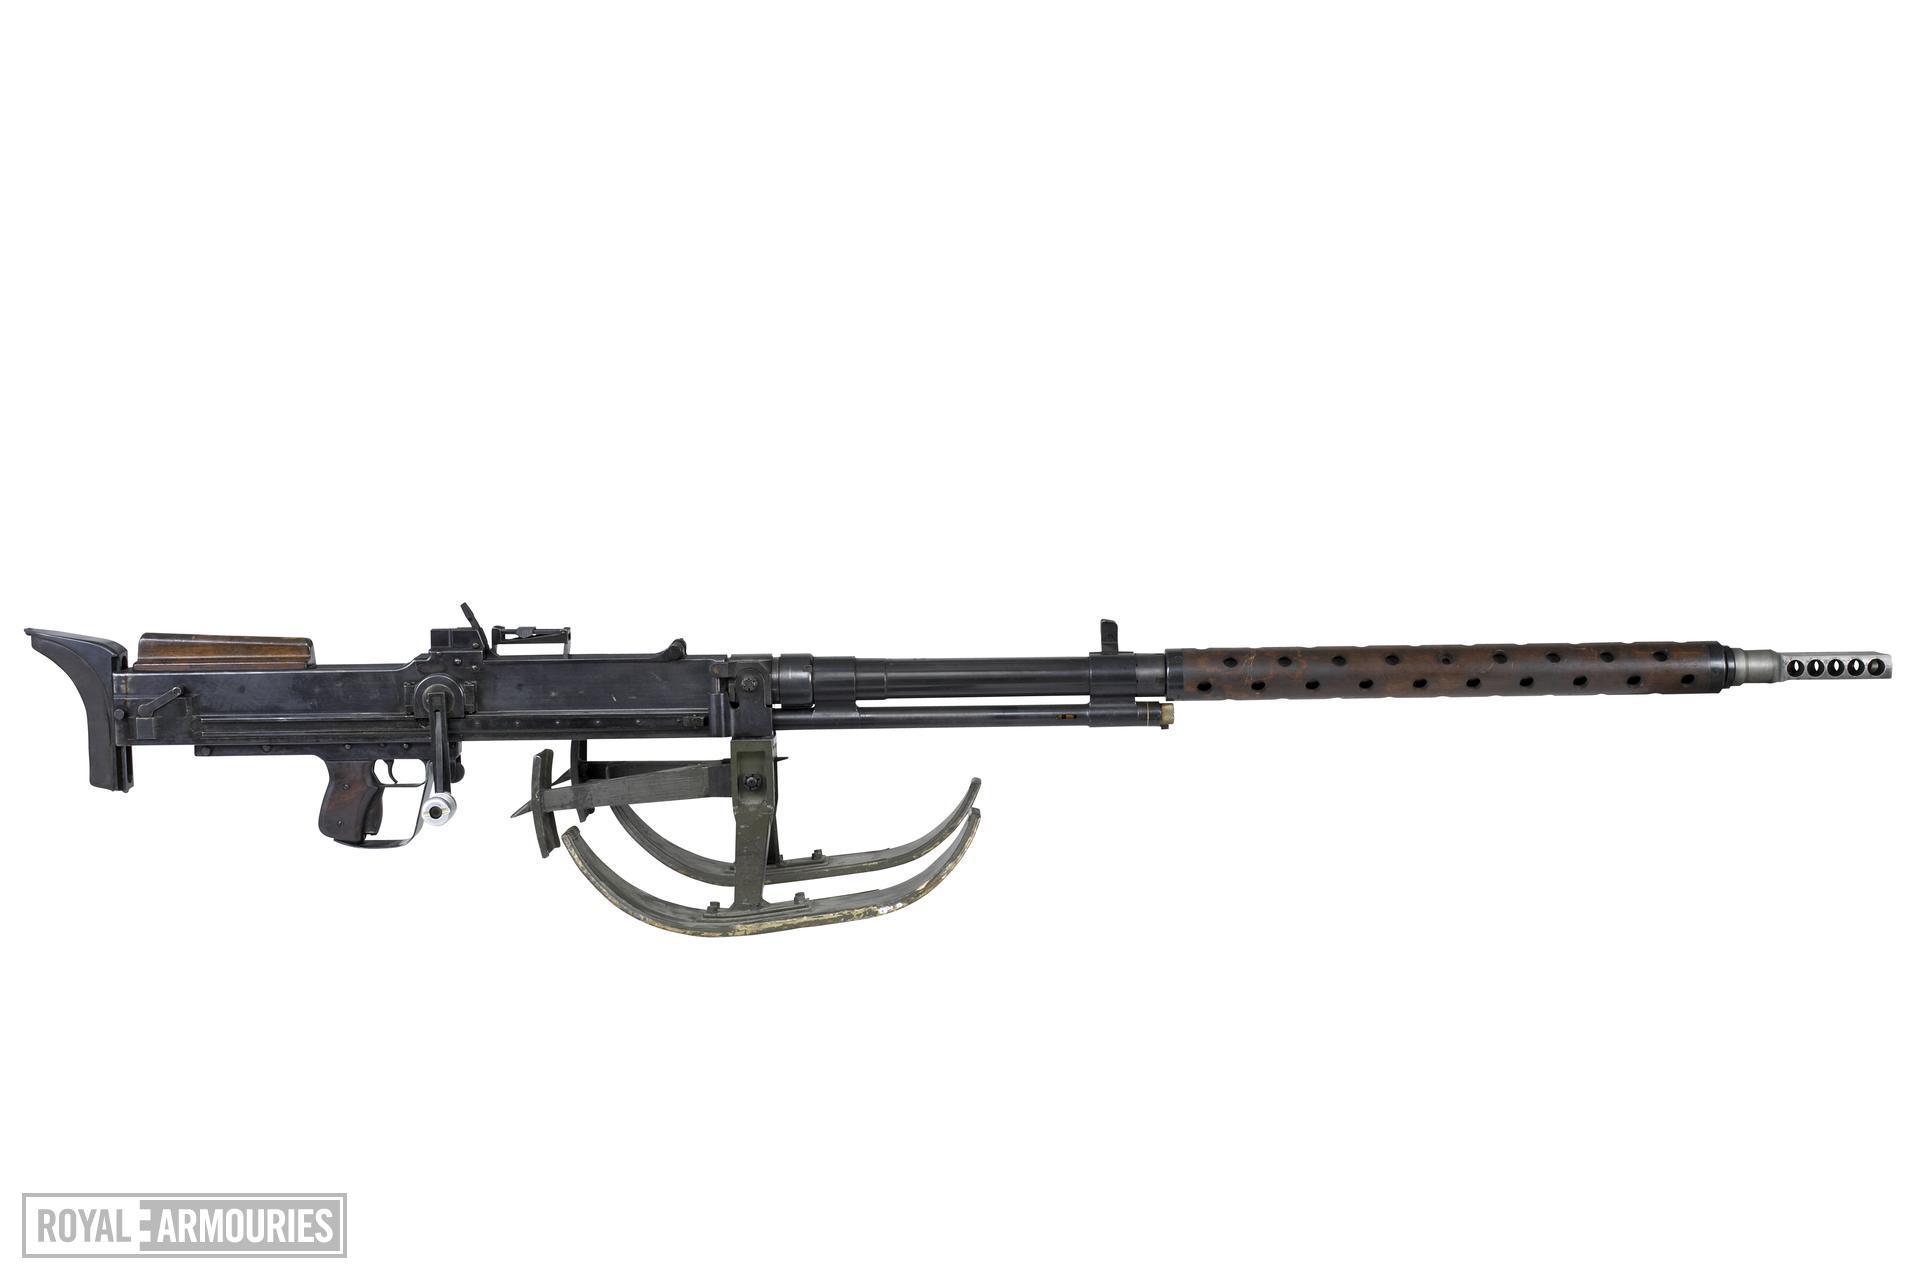 Centrefire self-loading rifle - Lahti M-39